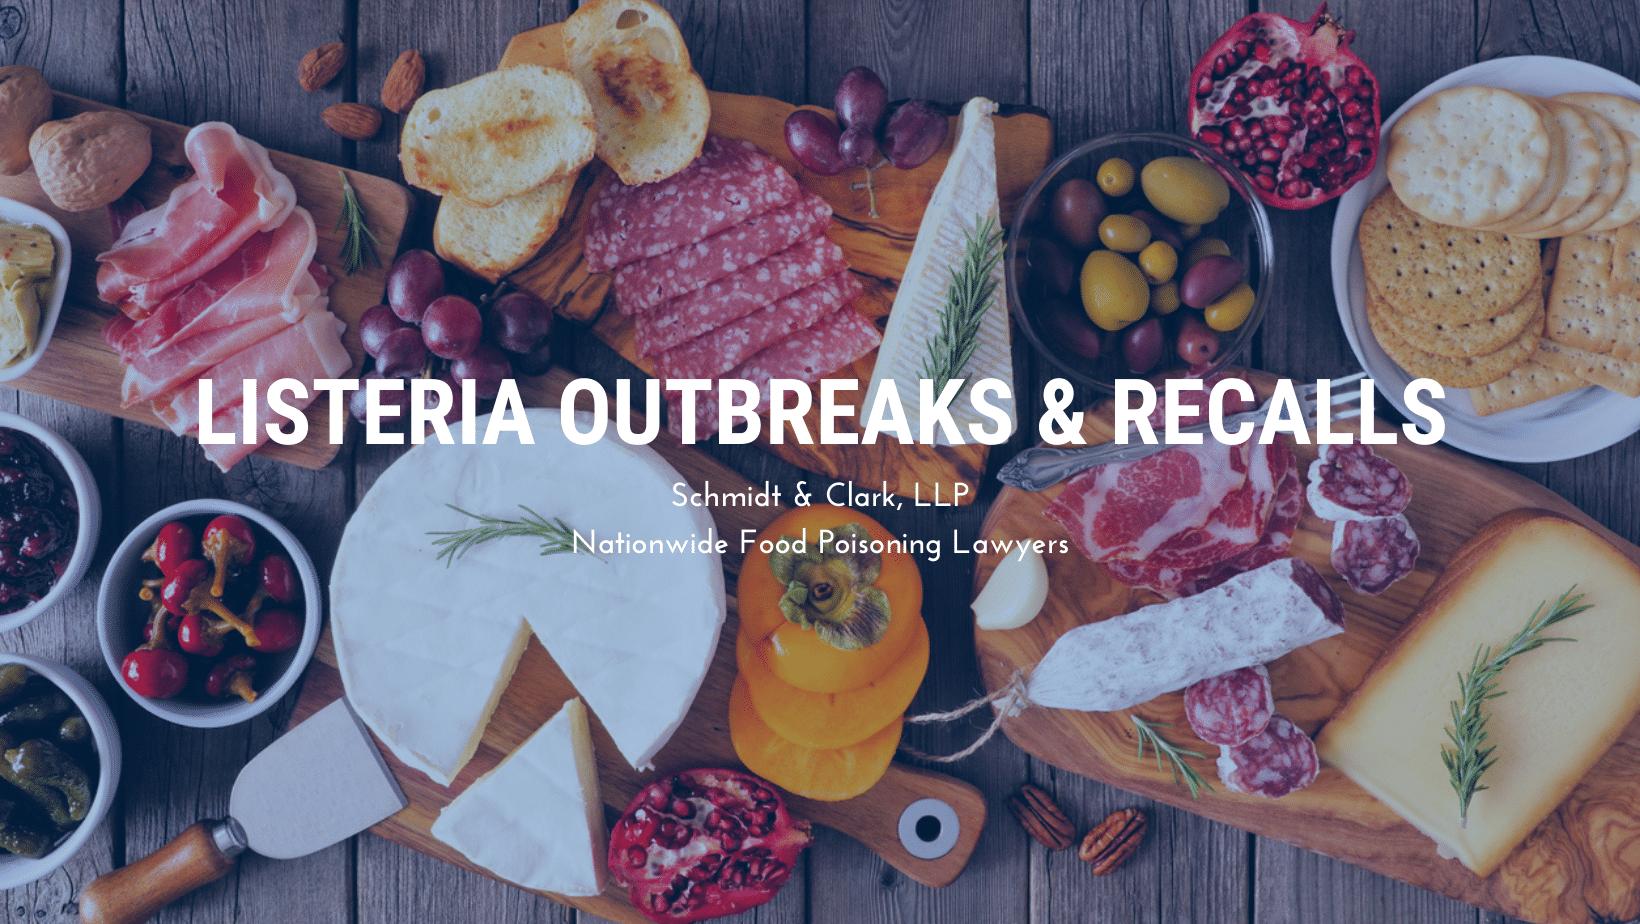 Listeria Outbreaks & Recalls